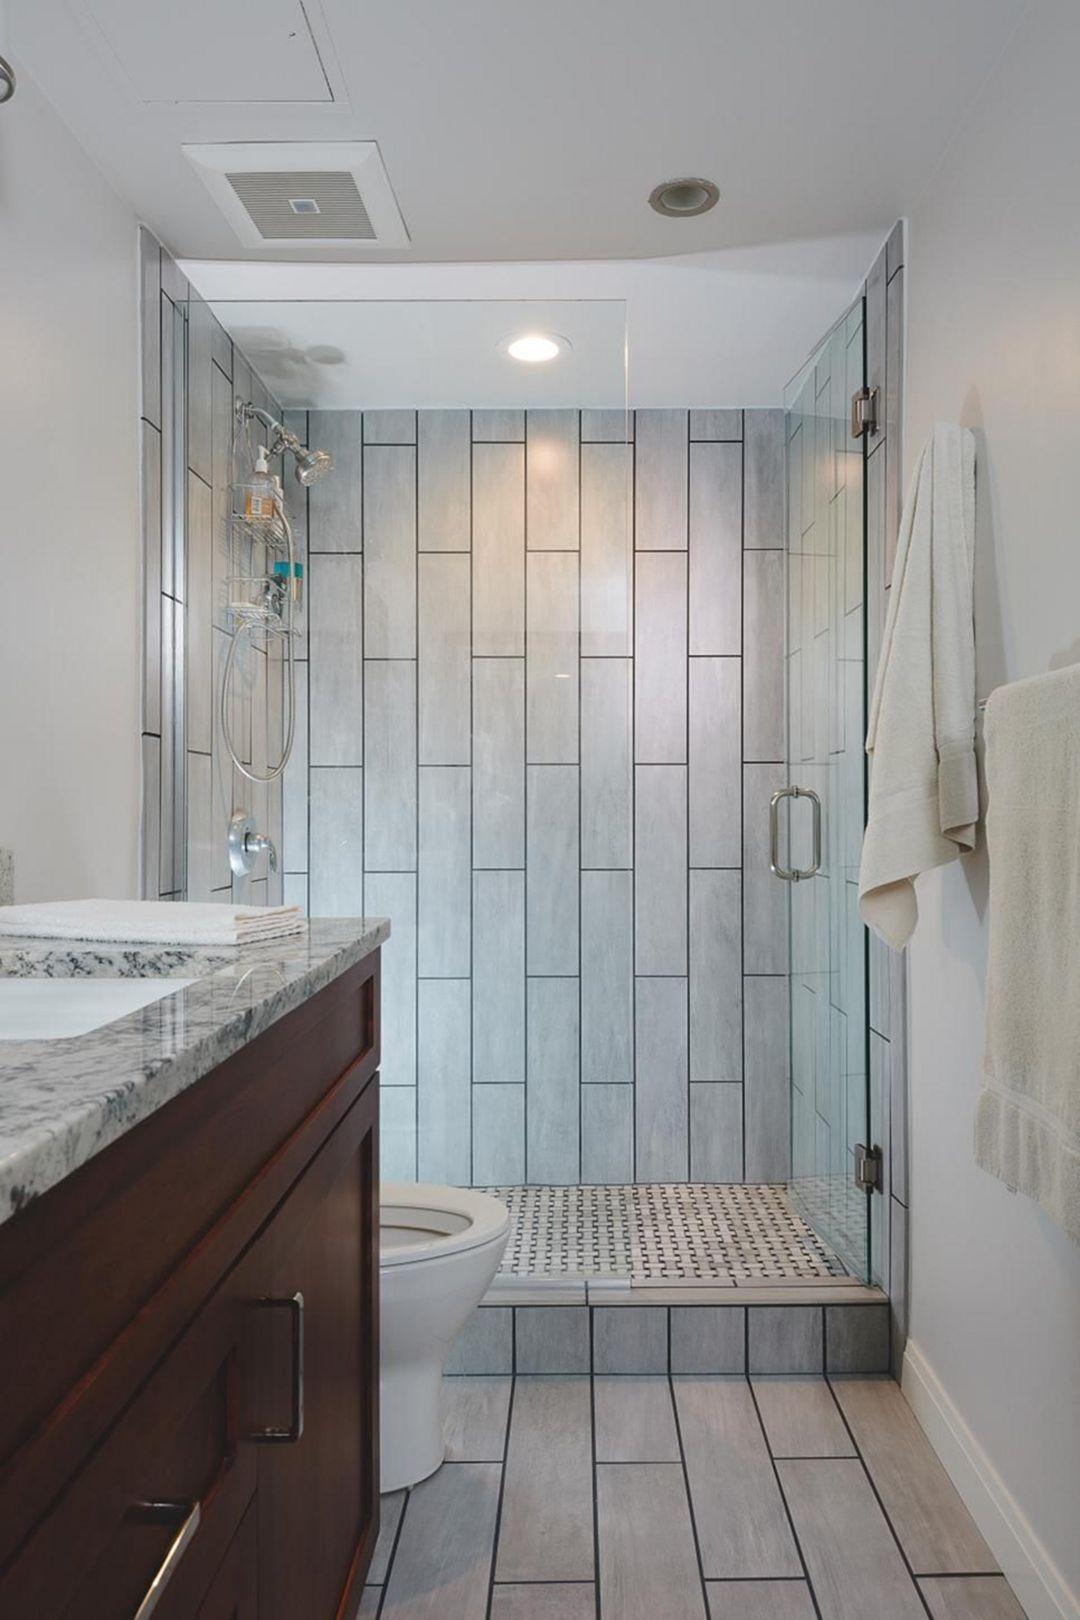 10 Awesome Small Modern Bathroom Design On A Budget Decorits Bathroom Design Small Modern Top Bathroom Design Modern Bathroom Design